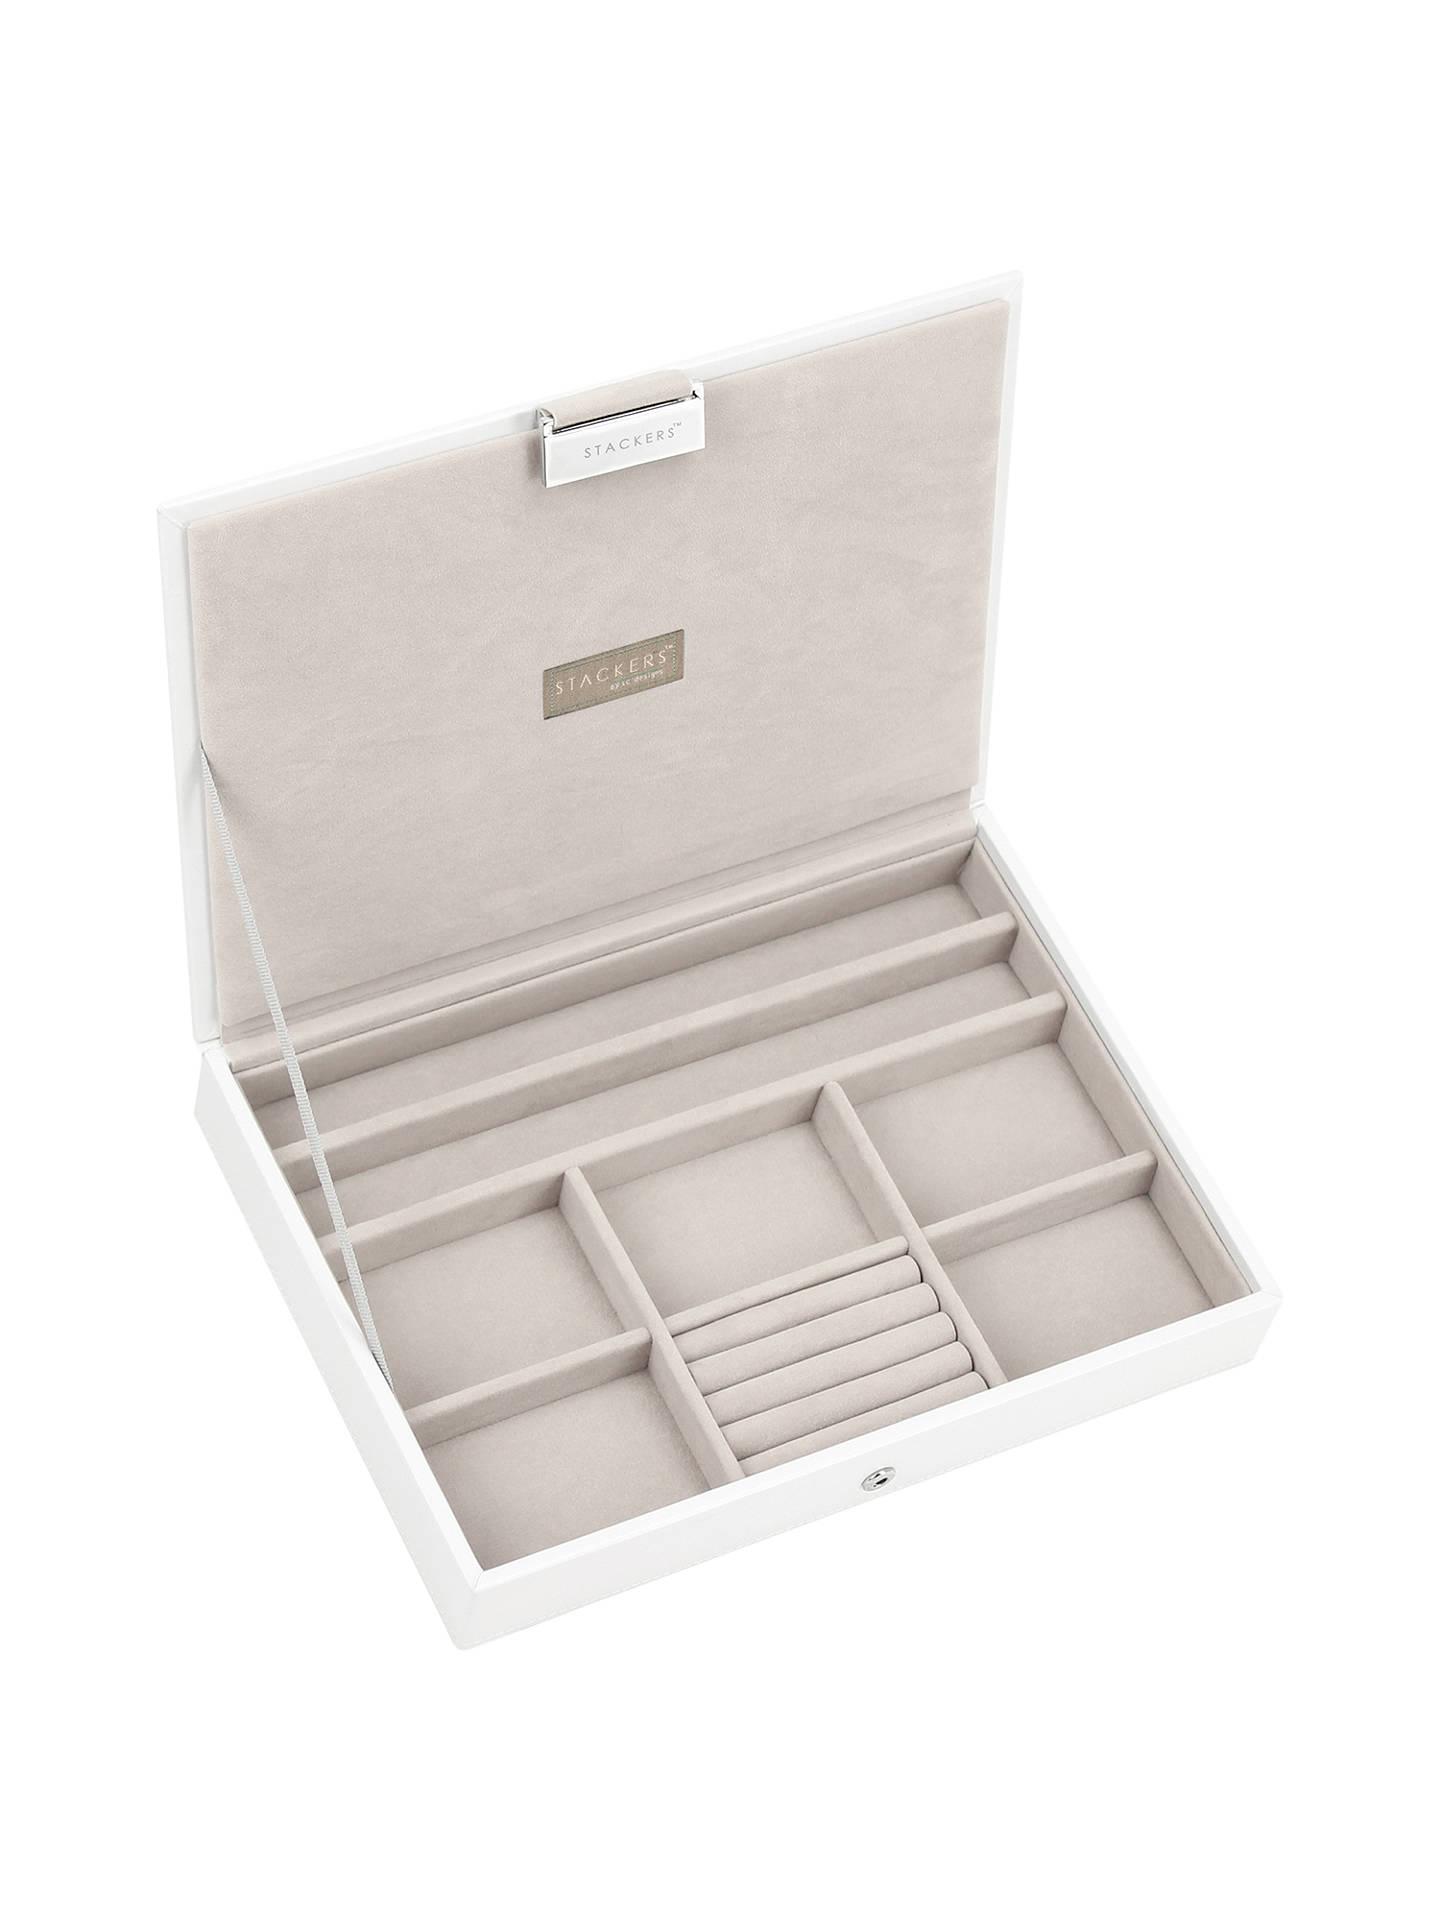 BuyStackers Jewellery Box Lid e203e6efbb